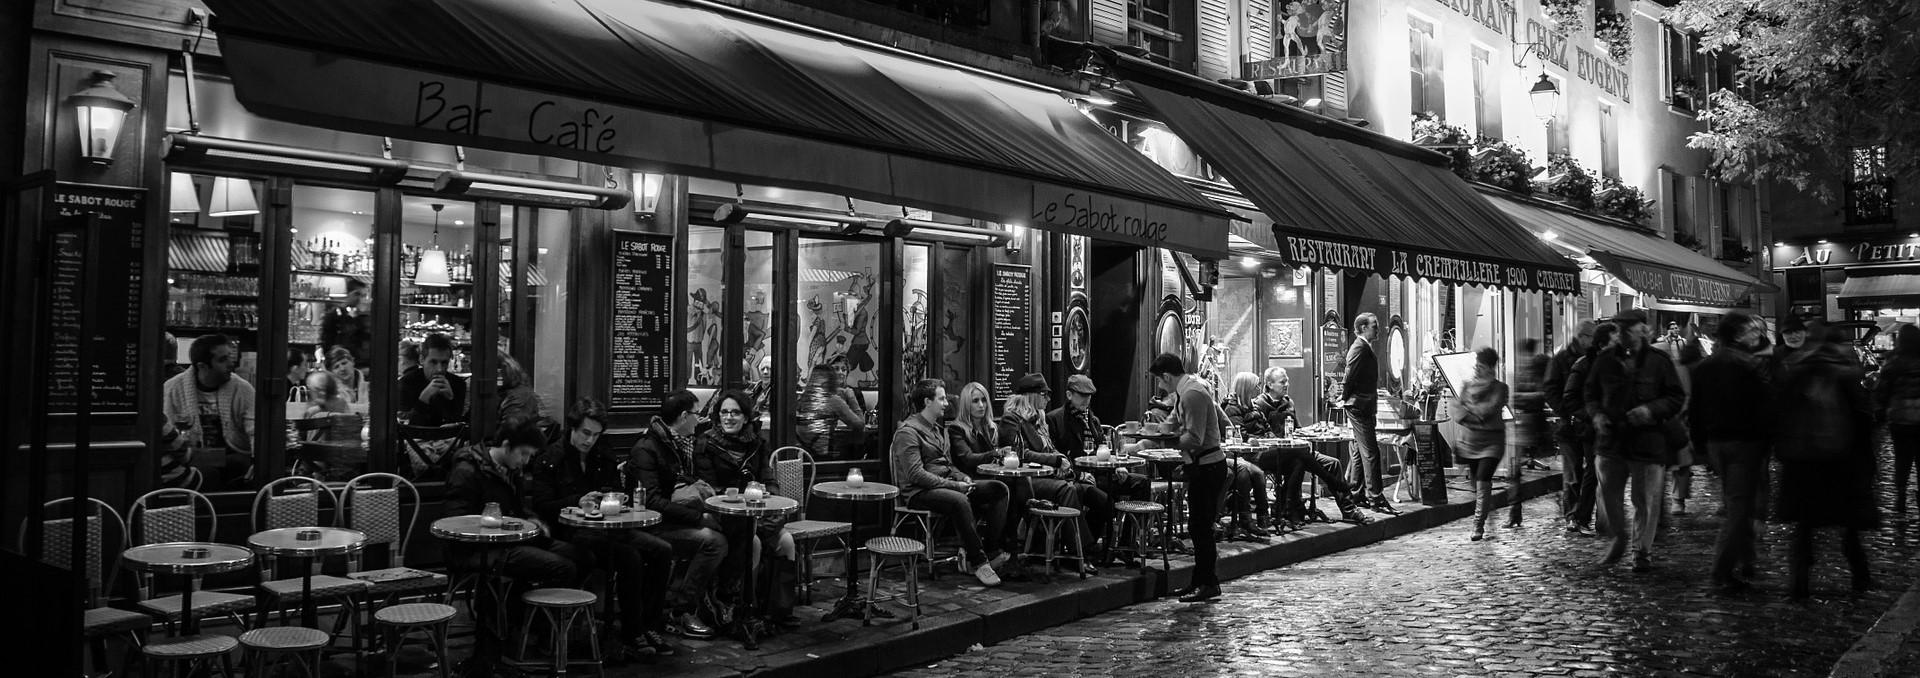 paris-1155008_1920_1.jpg